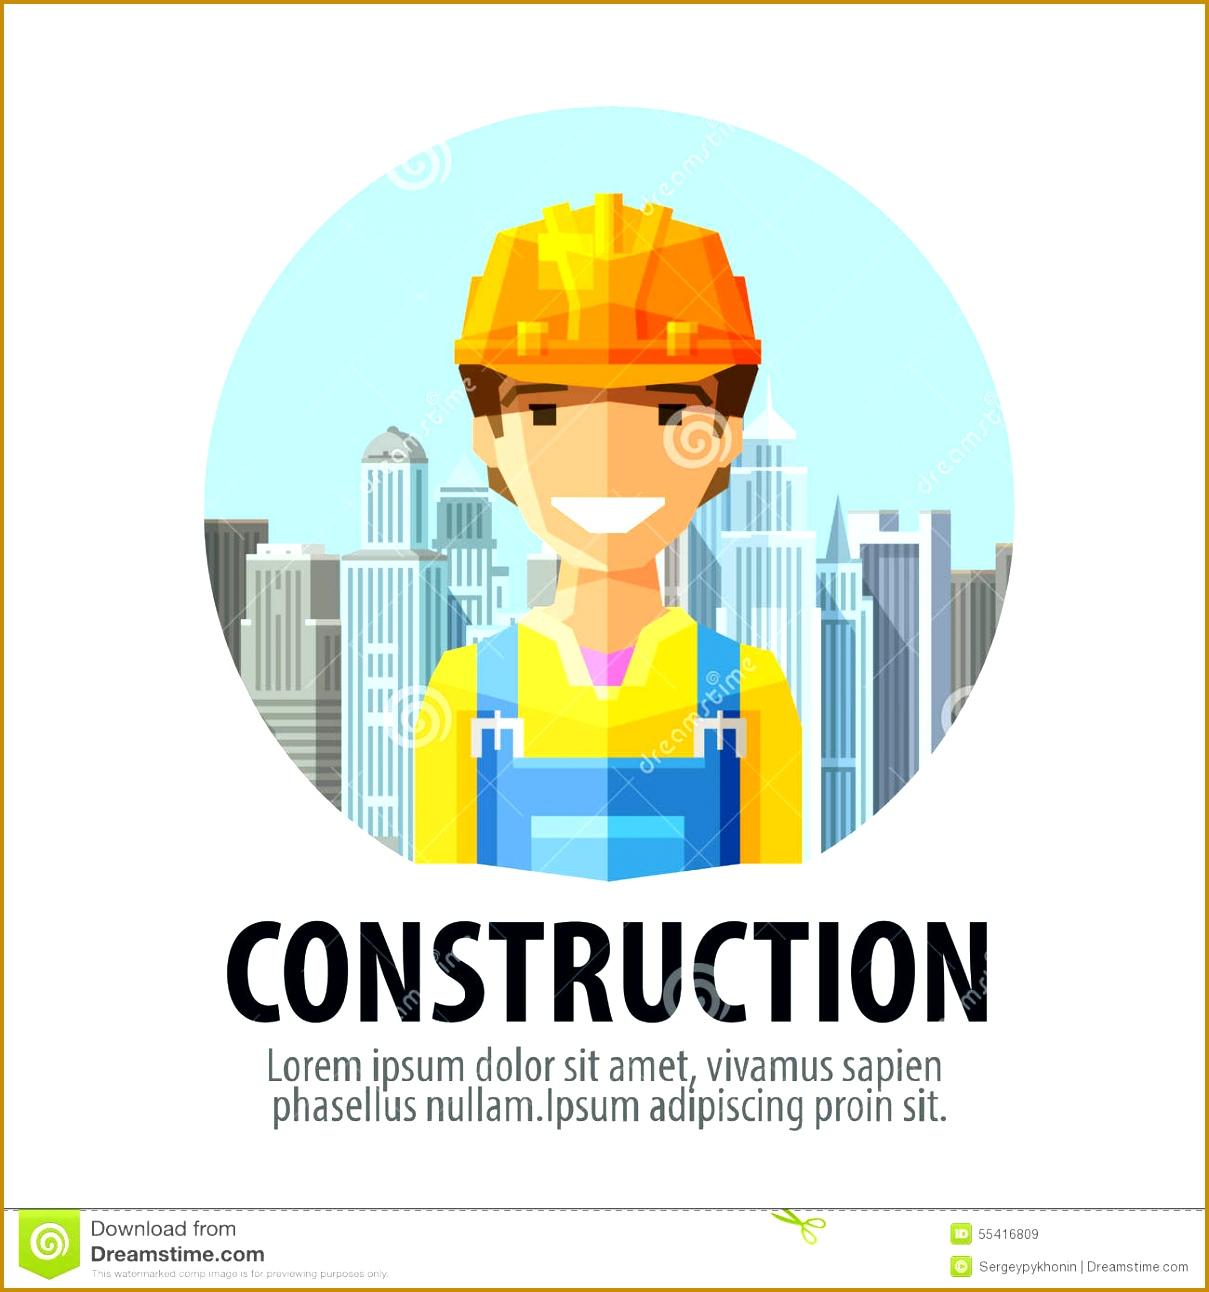 Royalty Free Vector Download Construction pany Vector Logo Design 12921209